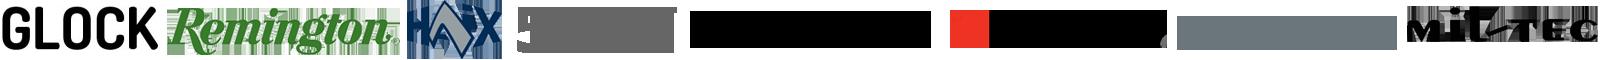 Specialforces.gr - Κυνηγετικα - Αστυνομικα - Στρατιωτικα είδη - Αρβυλα Καραμπινες Αλεξισφαιρα γιλεκα Αεροβολα οπλα πιστολια